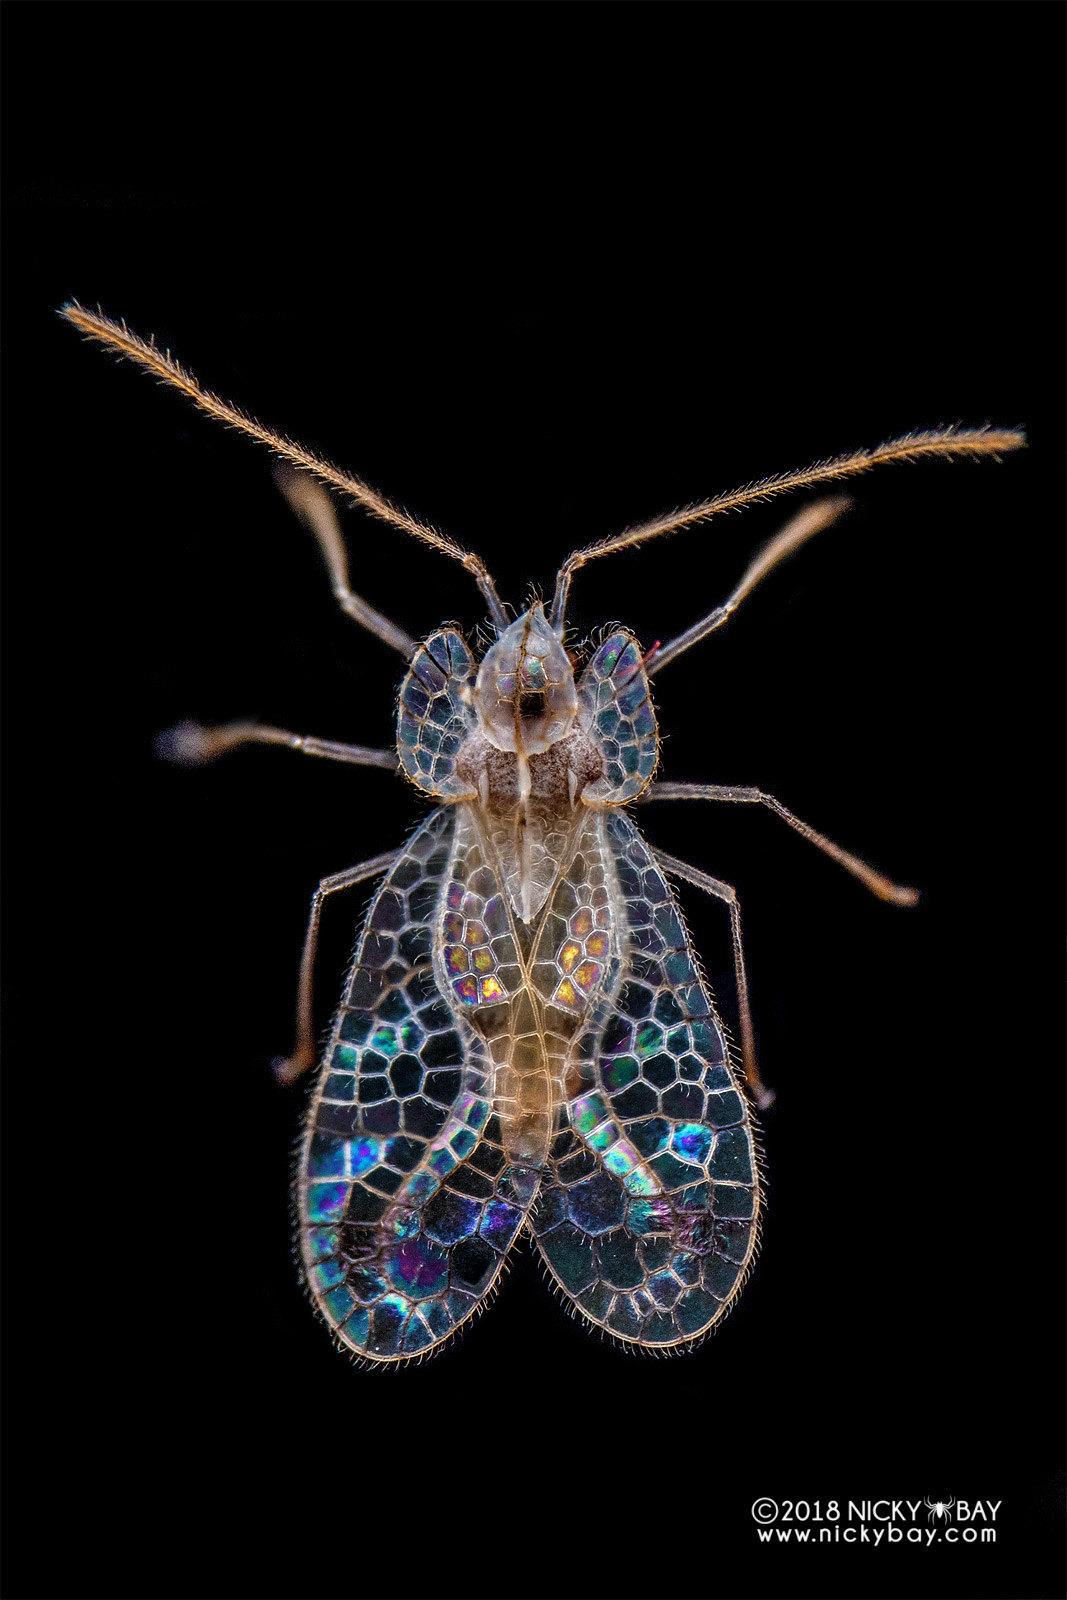 Lace bug (Stephanitis typicus) - DSC_3959